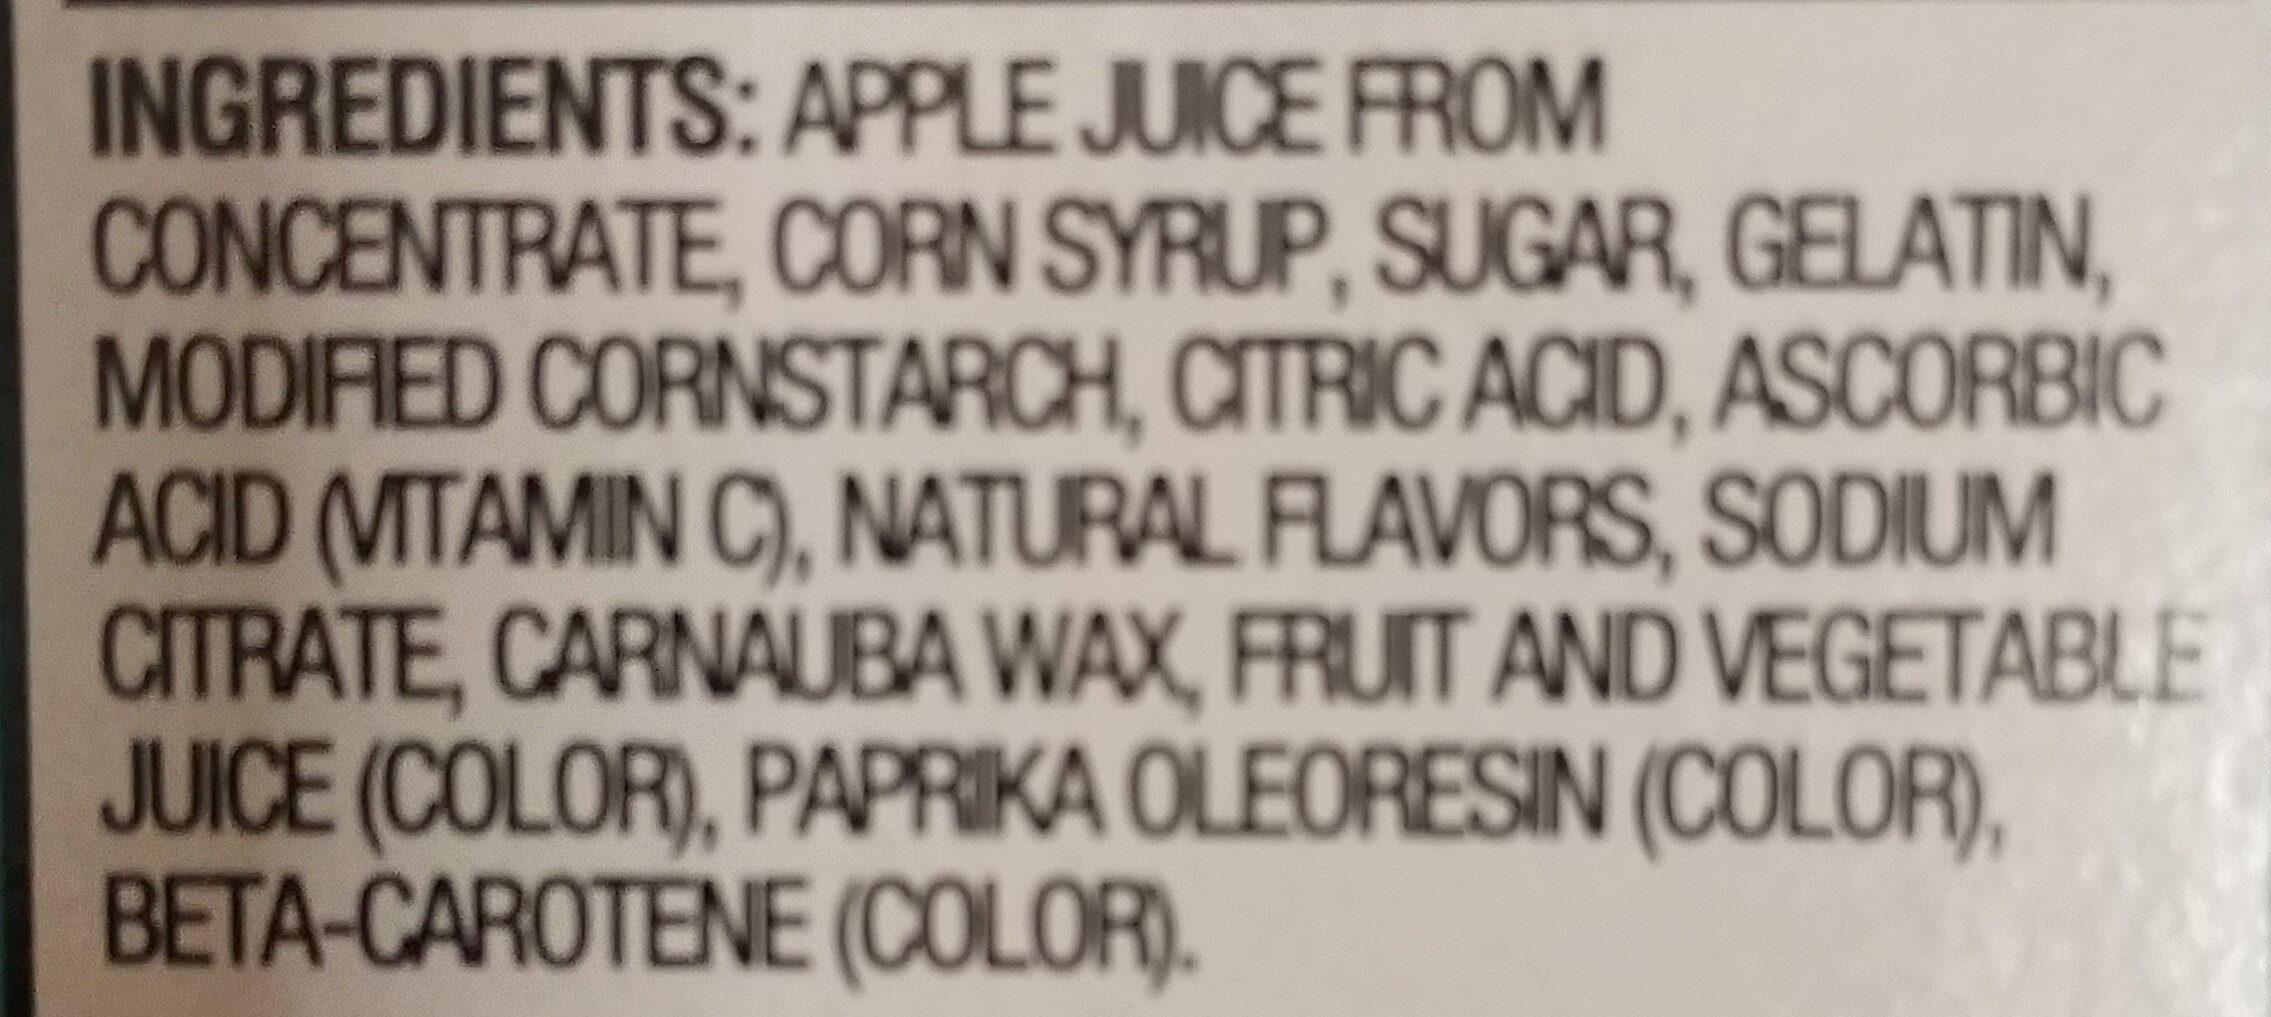 Fruit Flavored Snacks Assorted Tropical Flavors - Ingredients